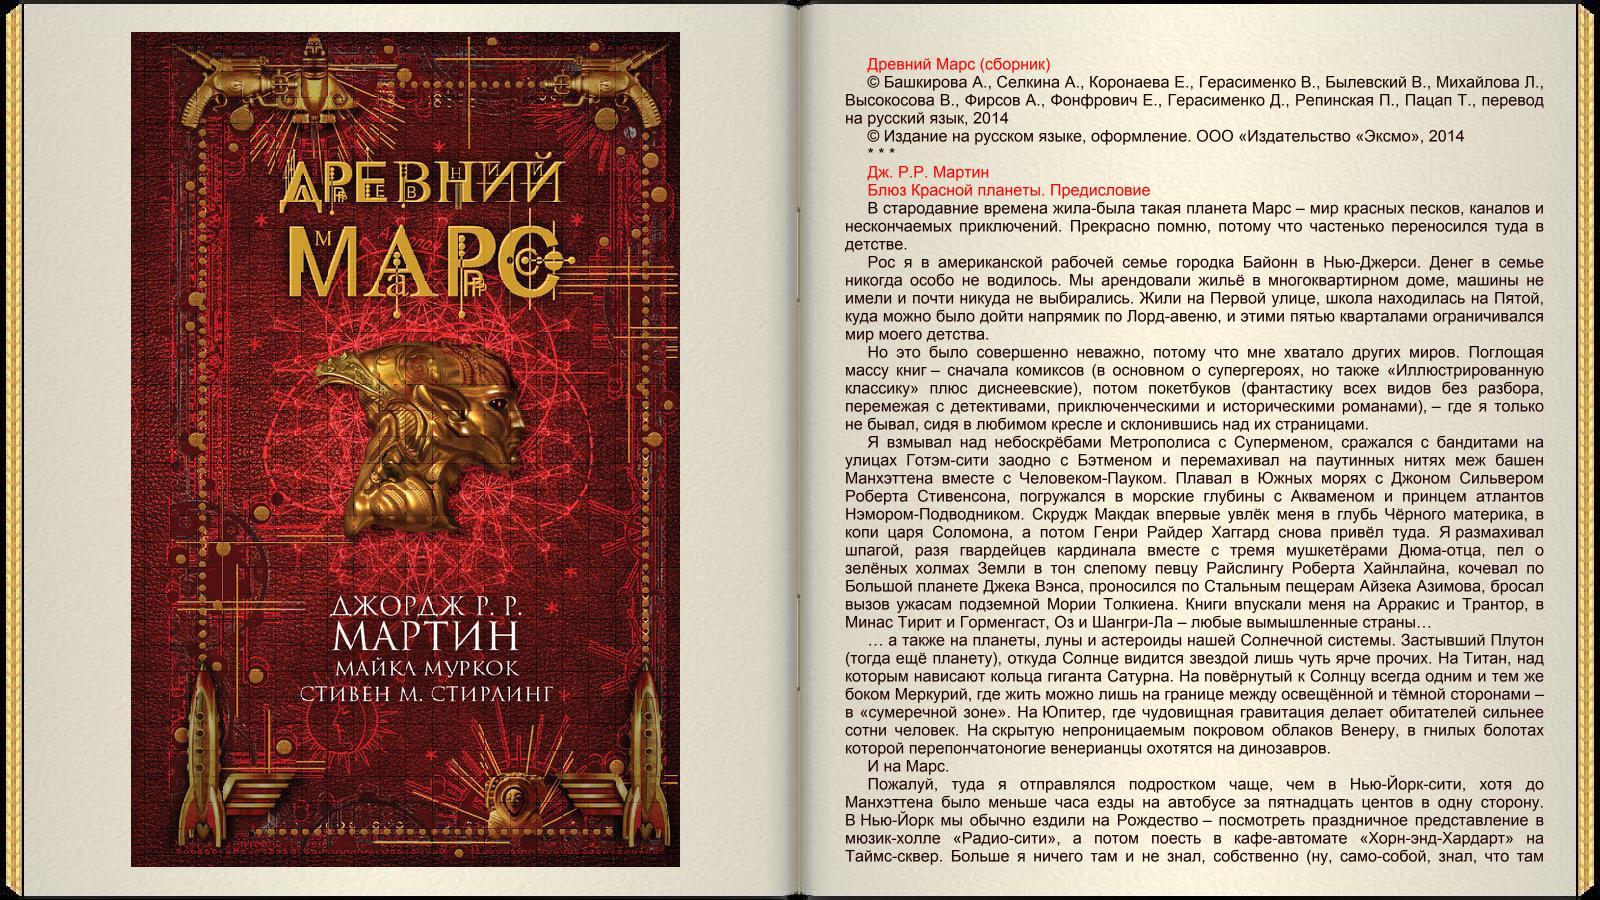 http://i2.imageban.ru/out/2016/01/30/e6681a566a6838ad1961de5fbe3ace99.jpg